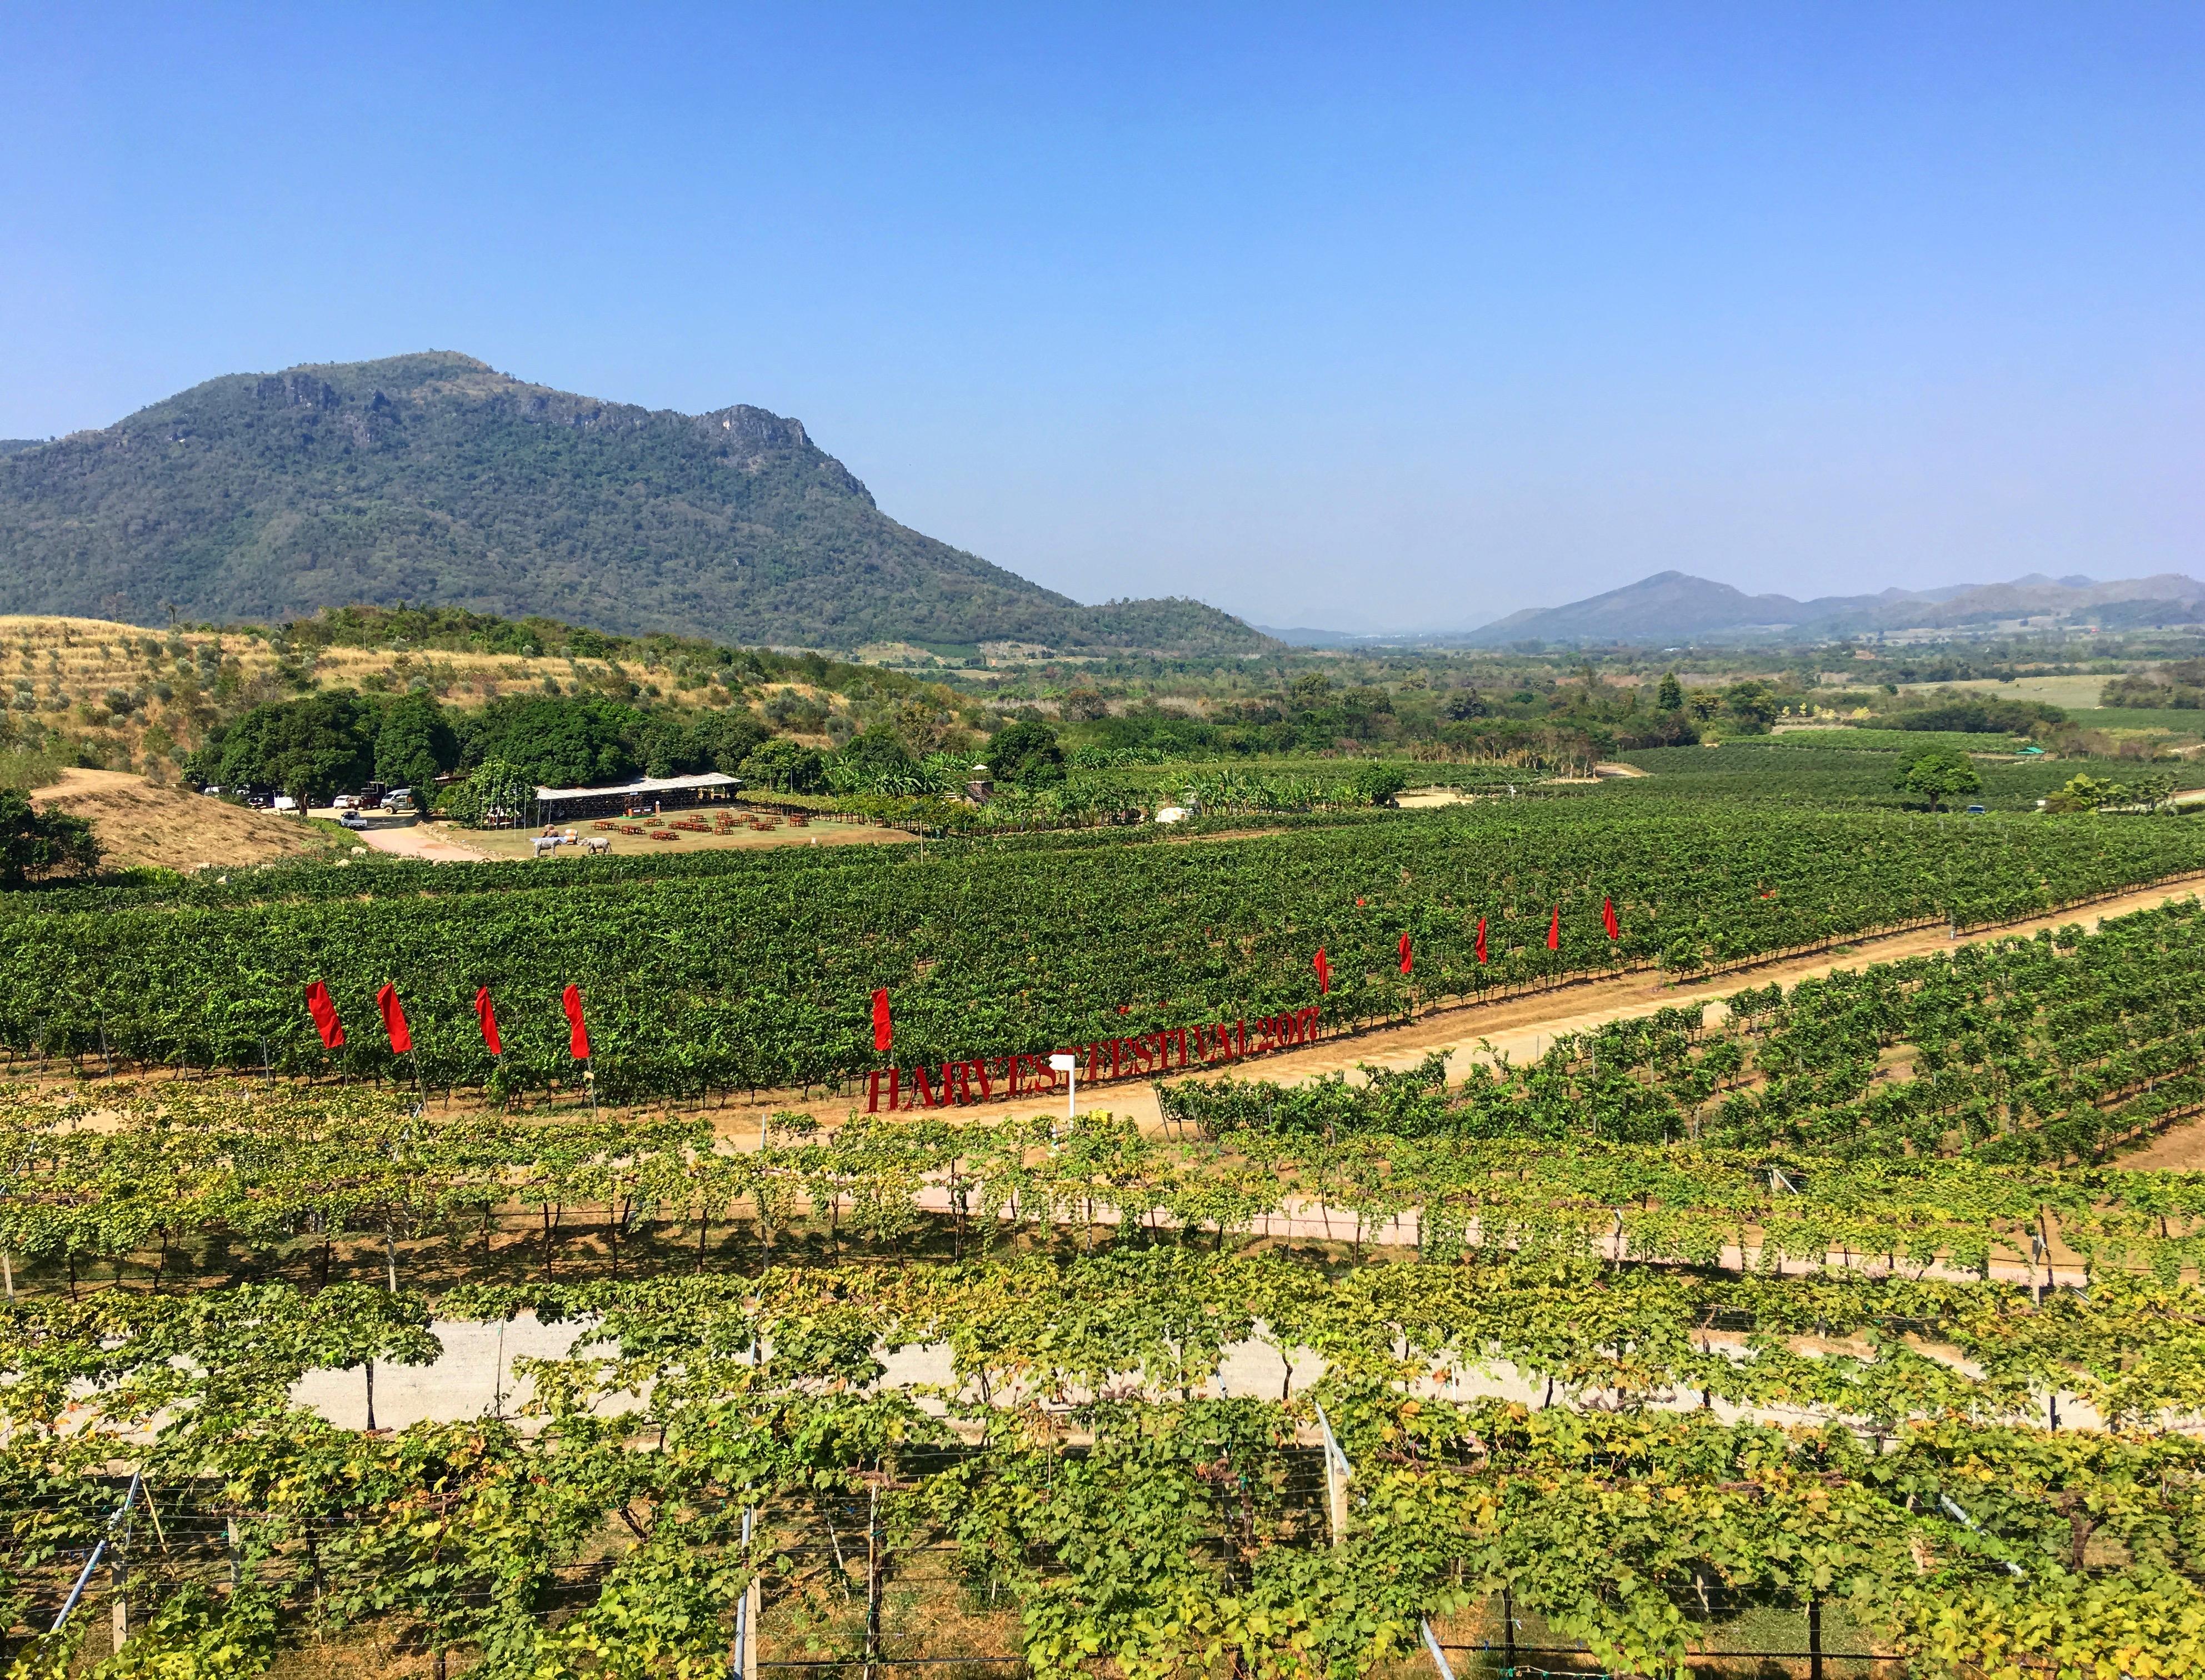 HuaHin Winery Vineyard Tour1日目